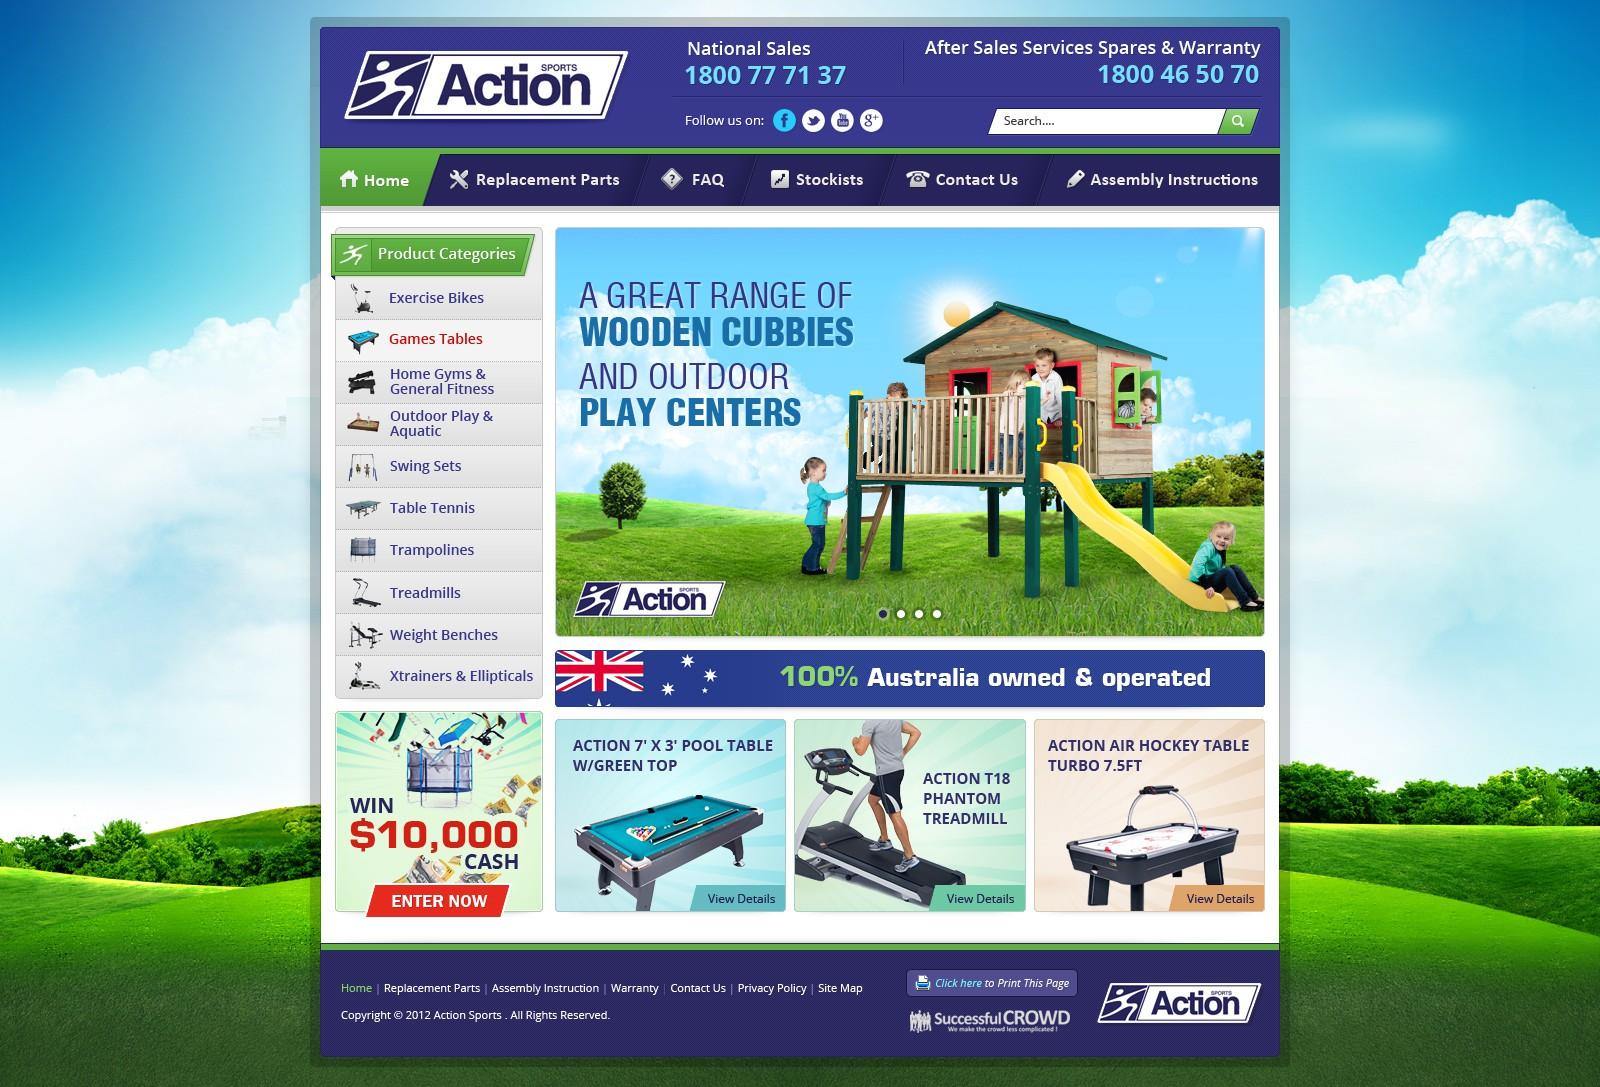 Action Sports needs a new website design